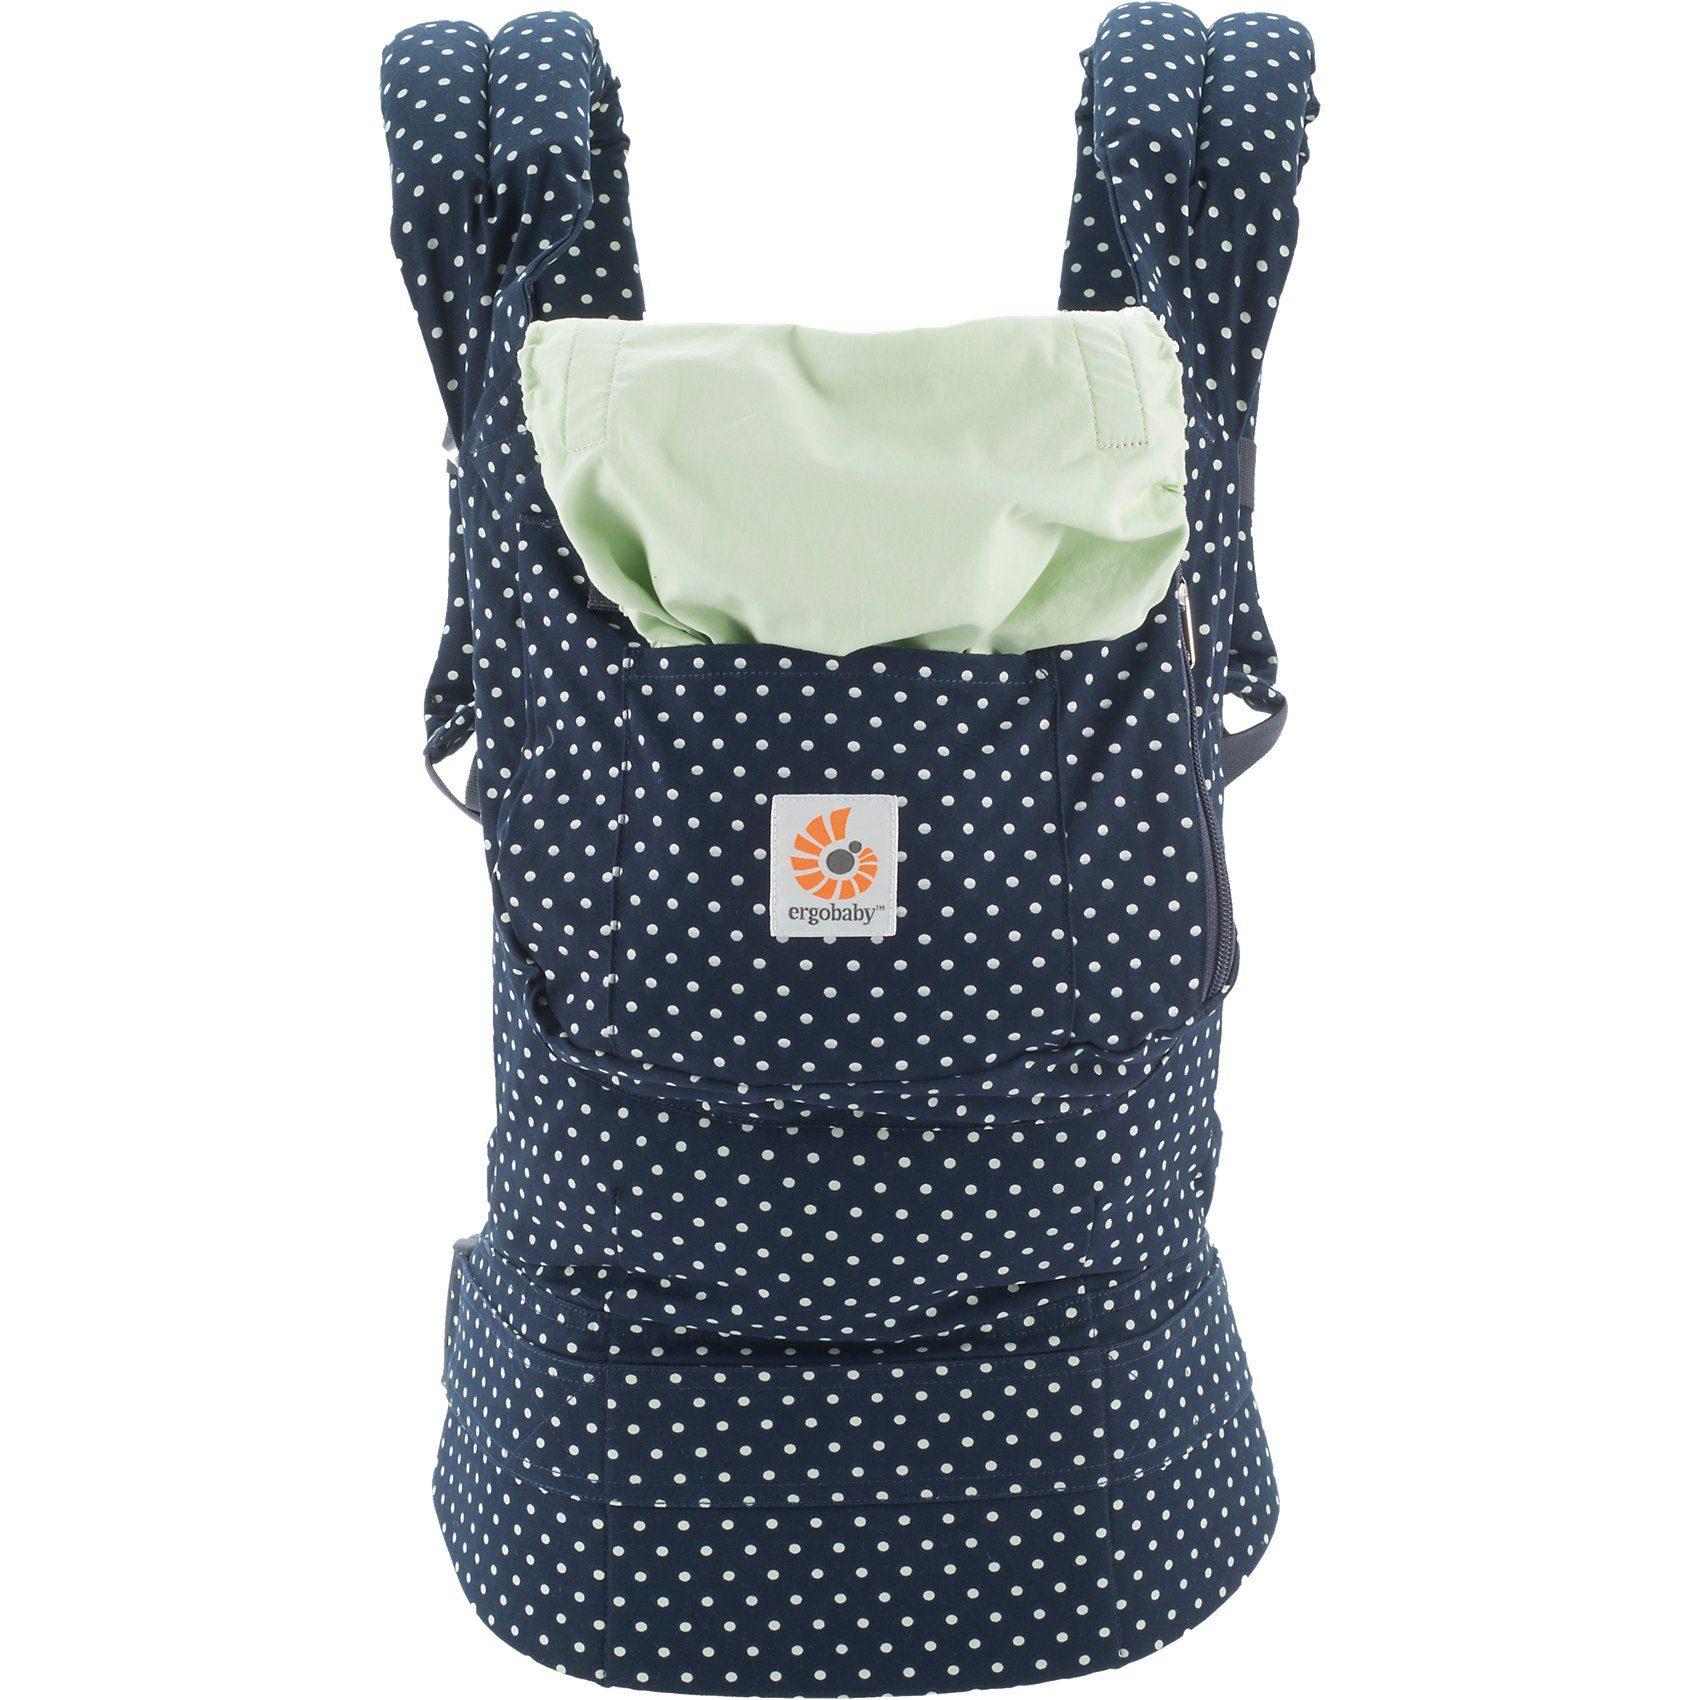 ERGObaby Babytrage Original, Indigo Mint Dots